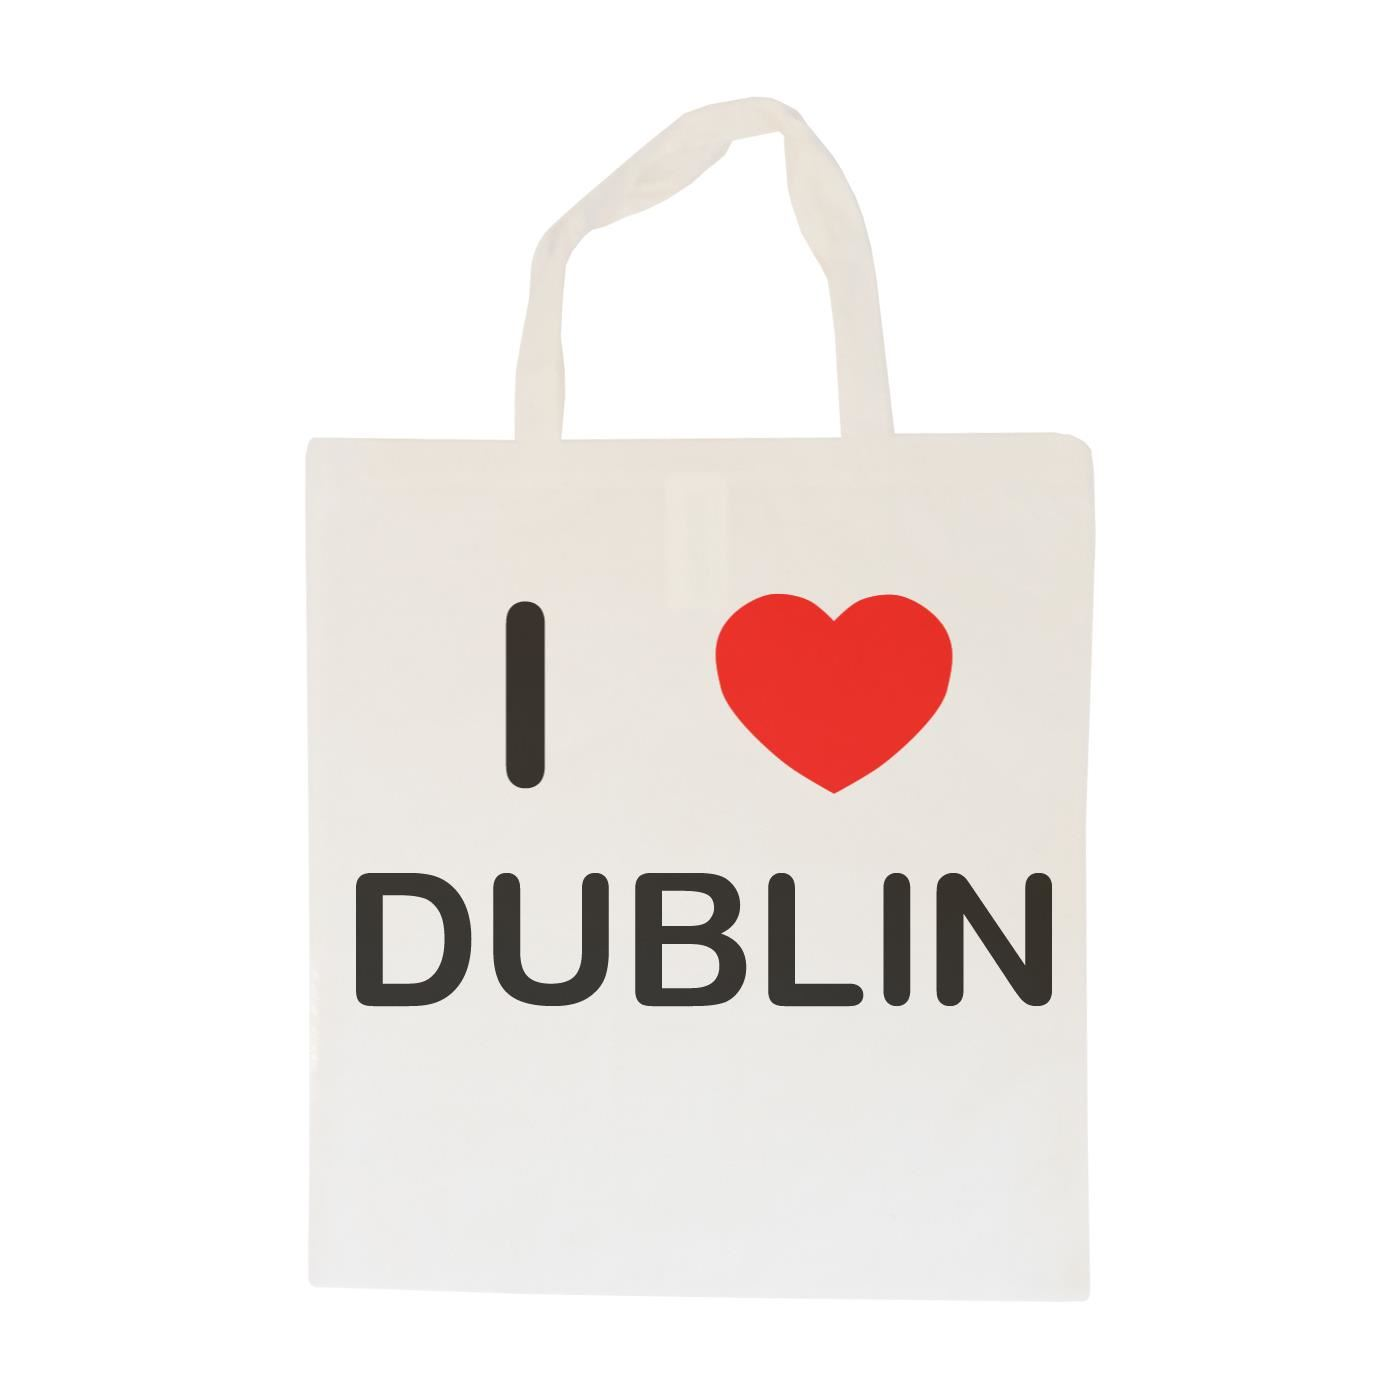 I Love Dublin - Cotton Bag | Size choice Tote, Shopper or Sling